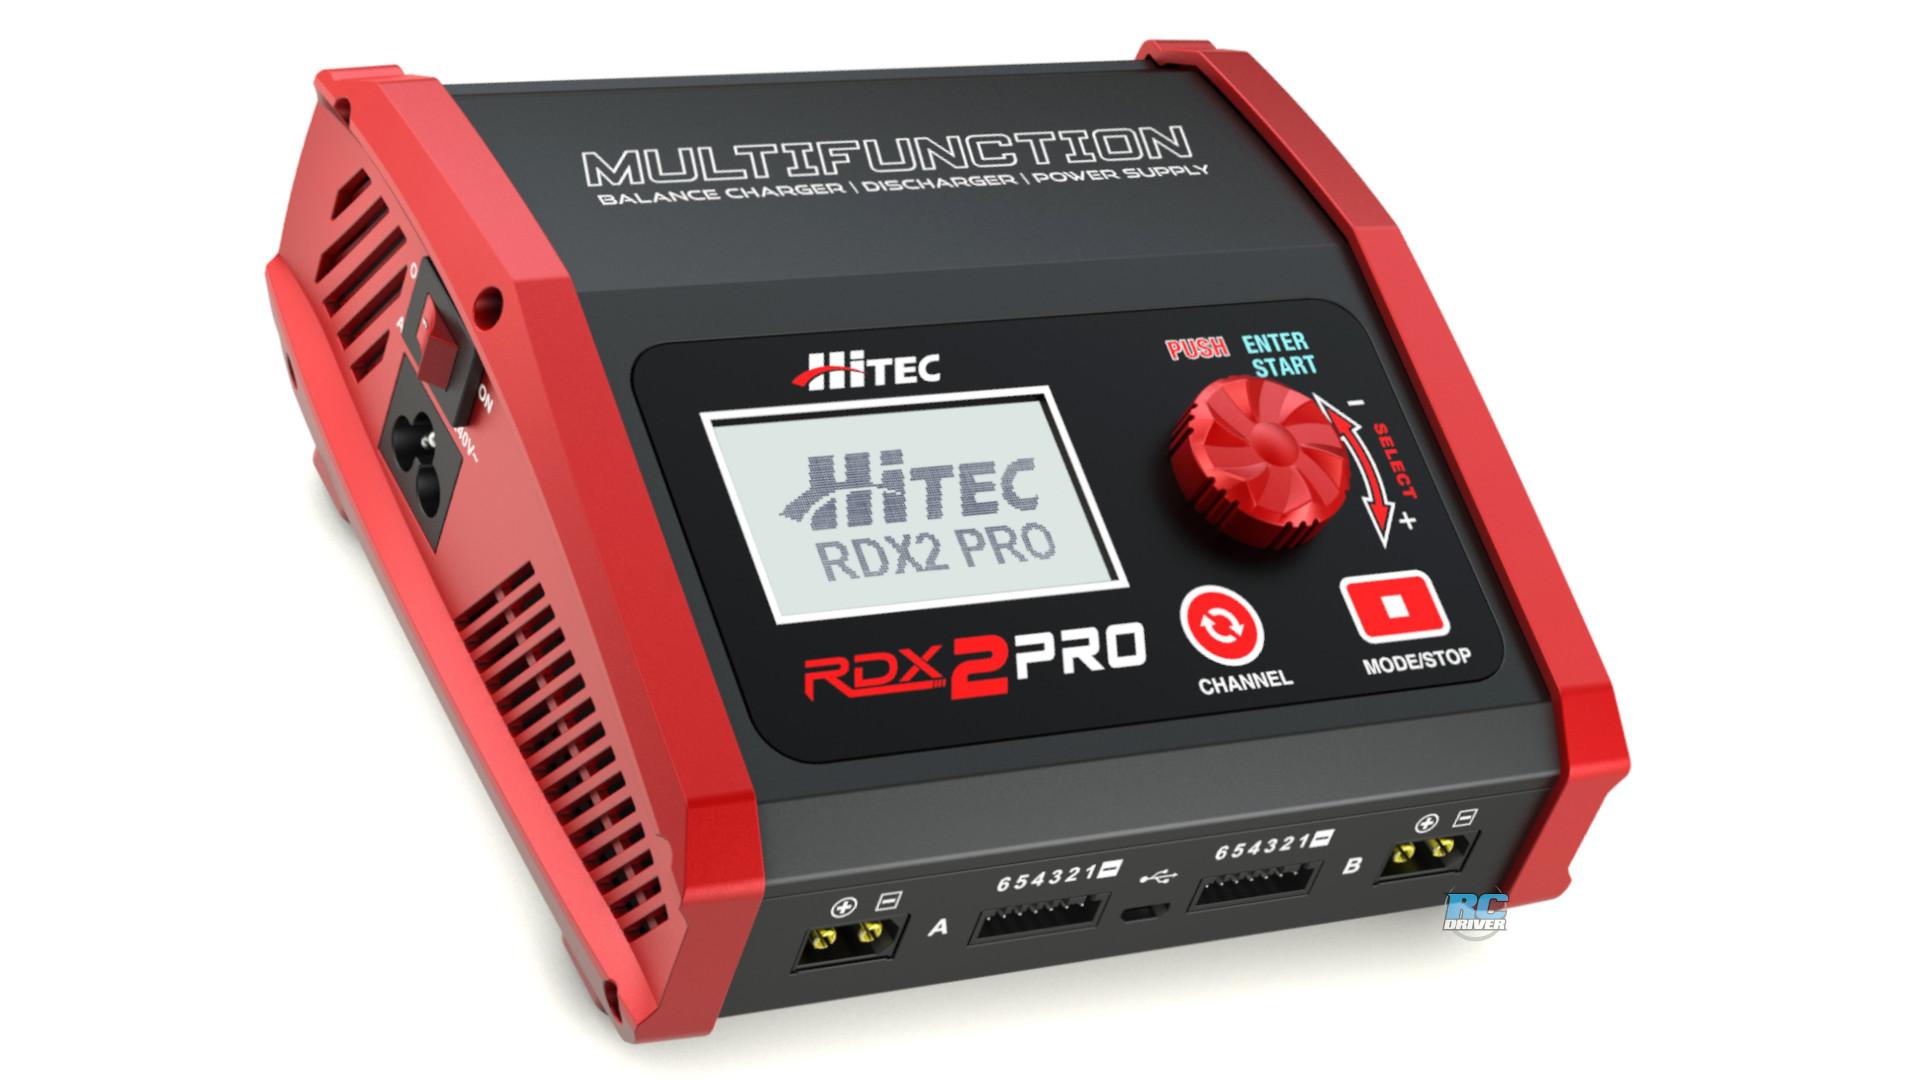 Hitec RDX2 Pro High-Power Dual Port Charger